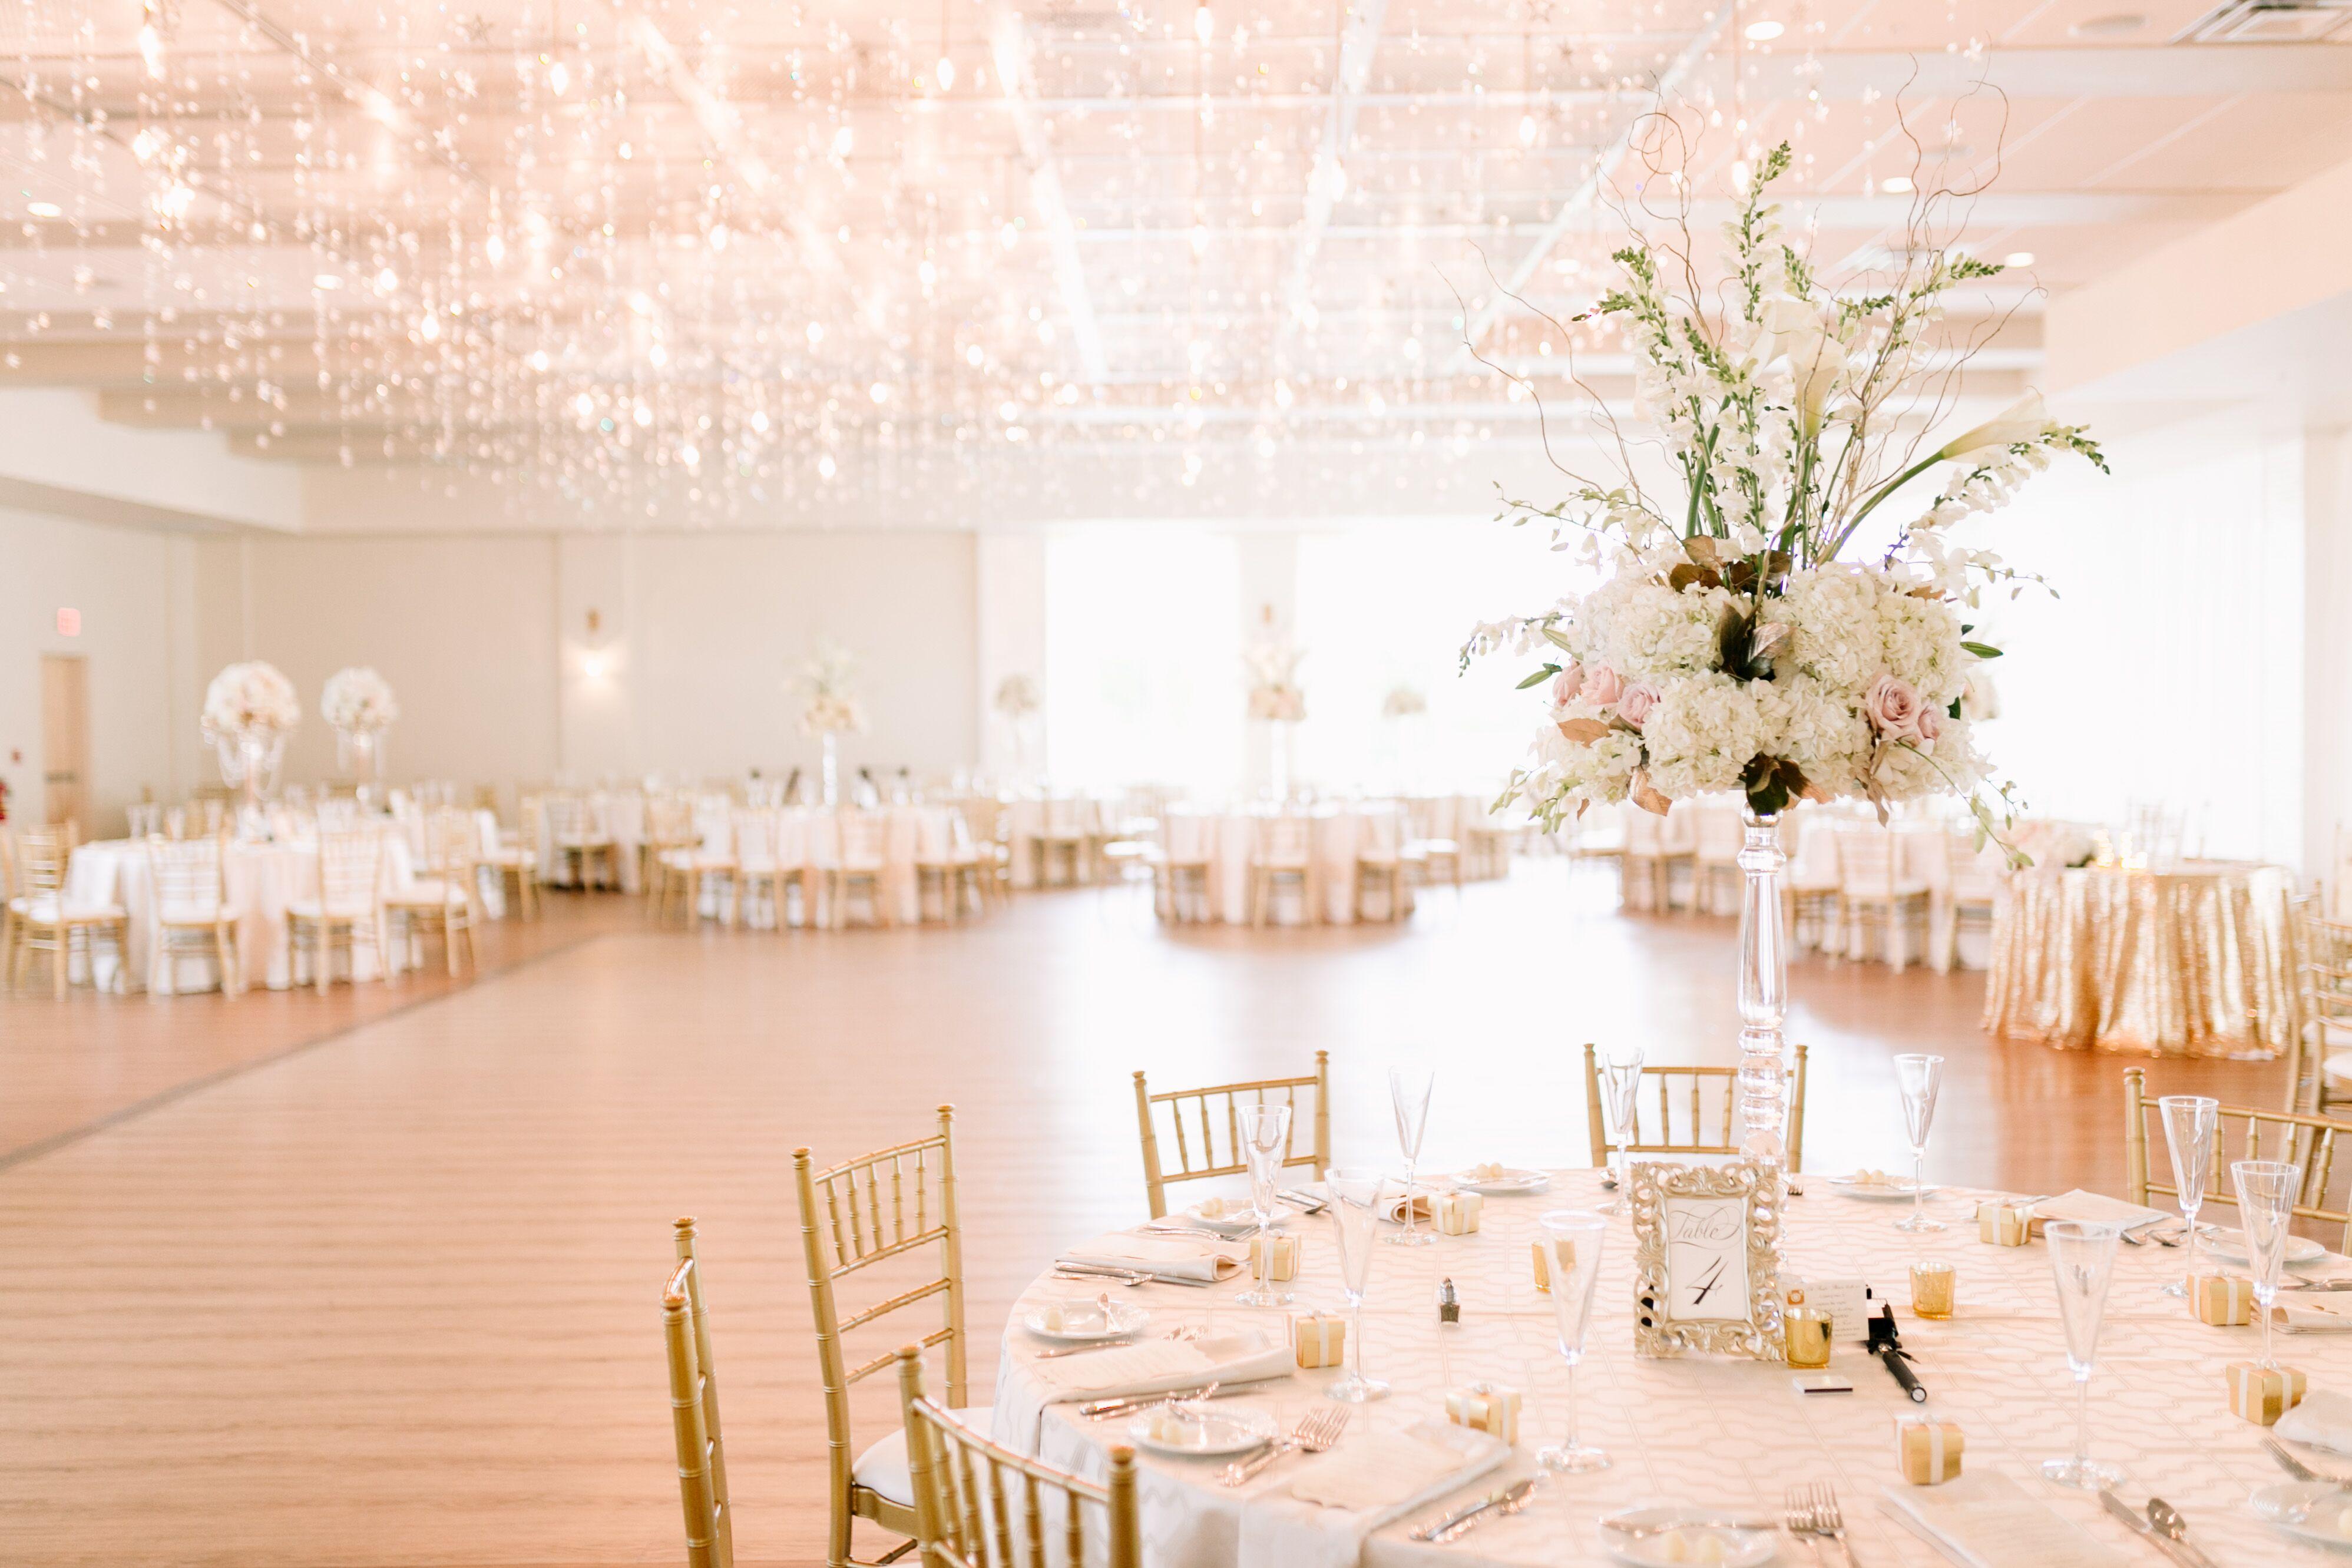 Wedding Venues In Bristol Ri The Knot